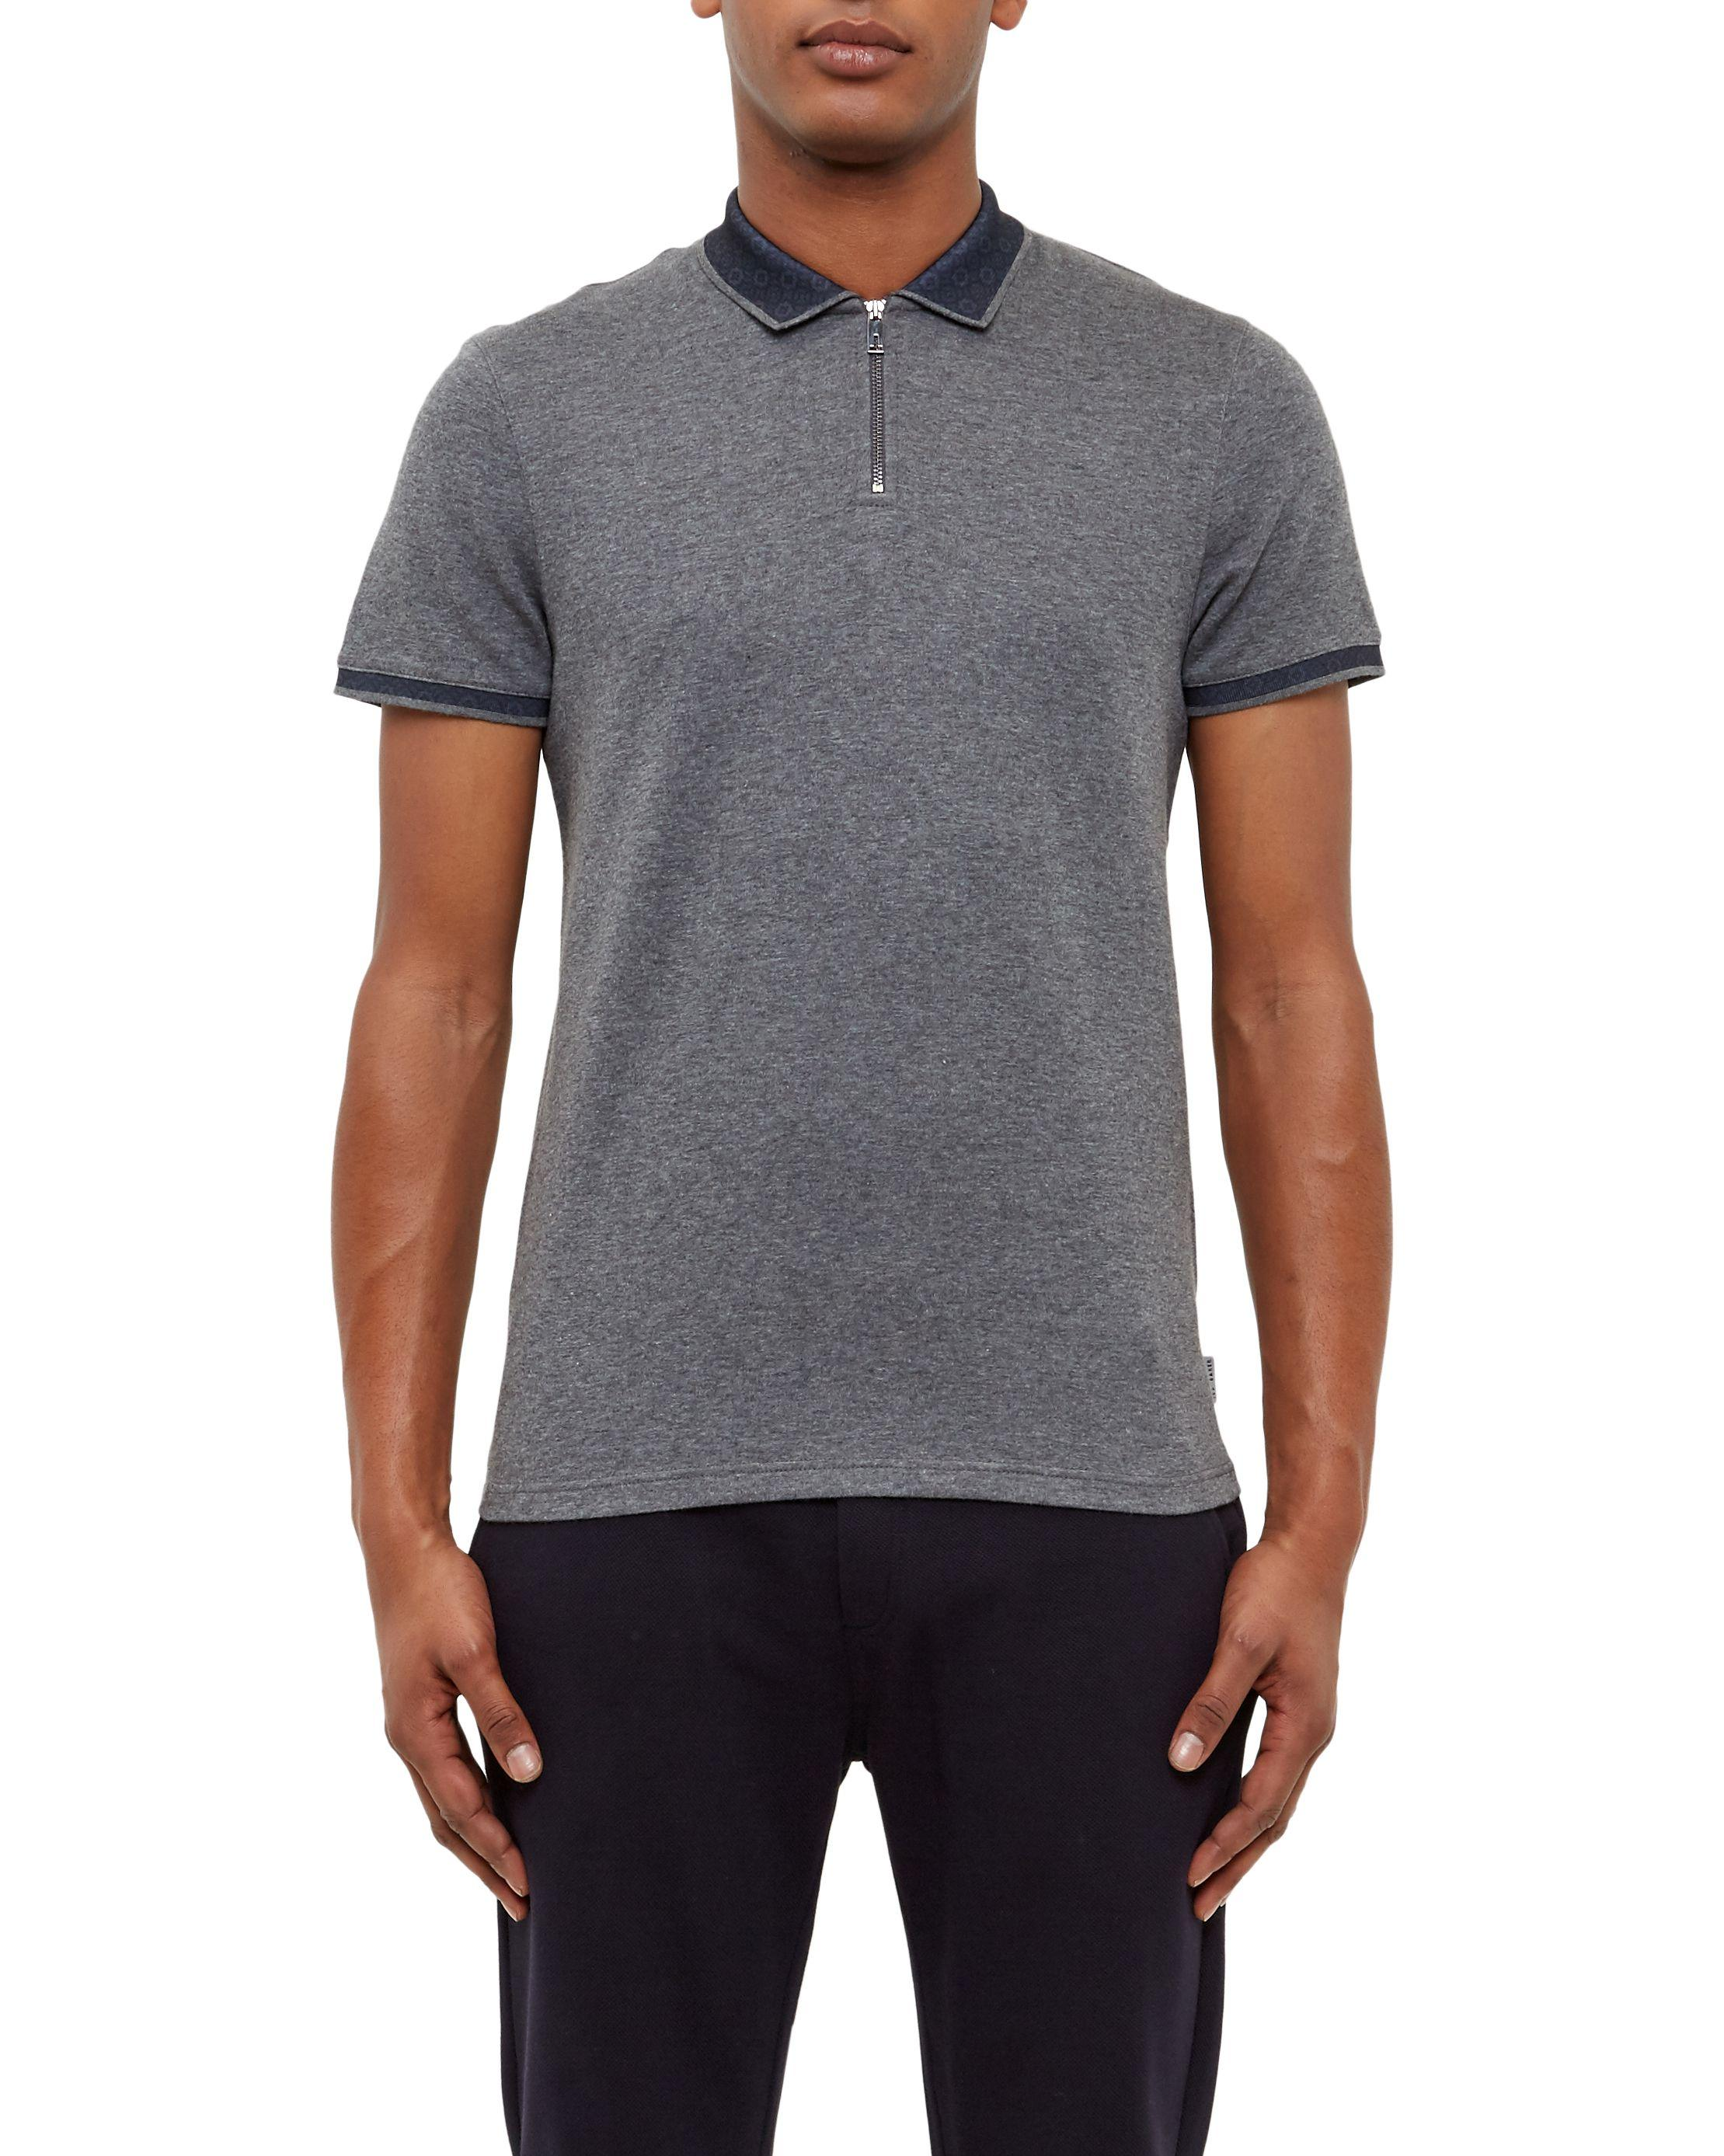 Ted baker zeno zip front polo shirt in gray for men lyst for Ted baker mens polo shirts